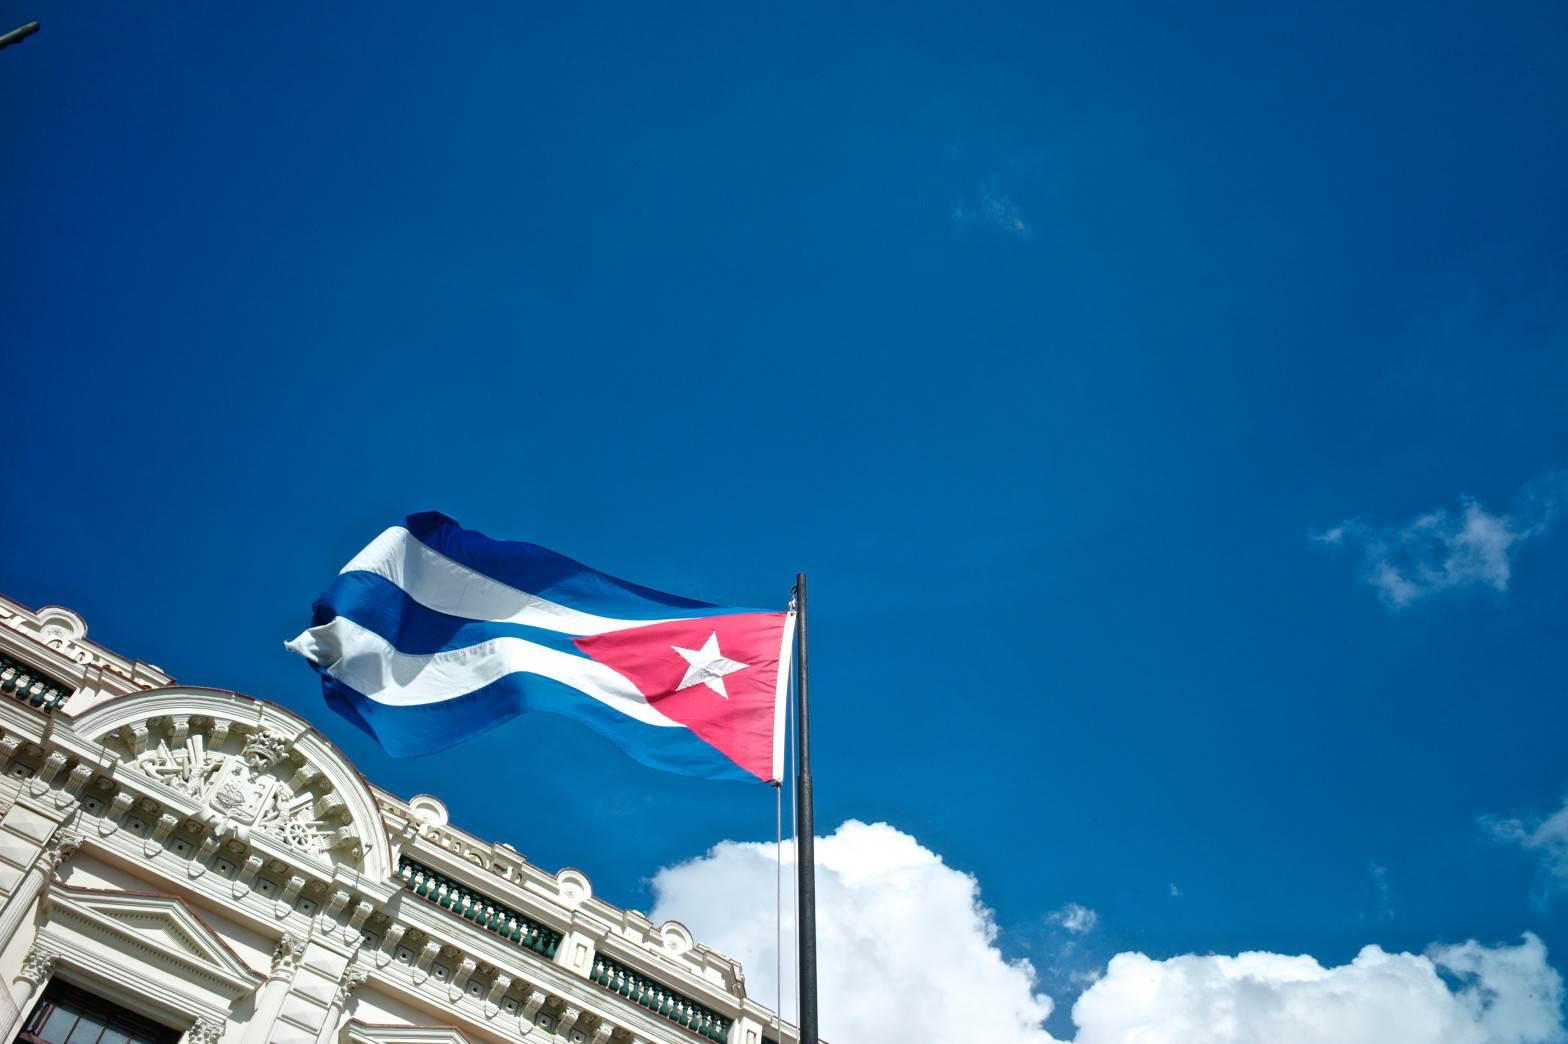 El asalto simbólico contra Cuba